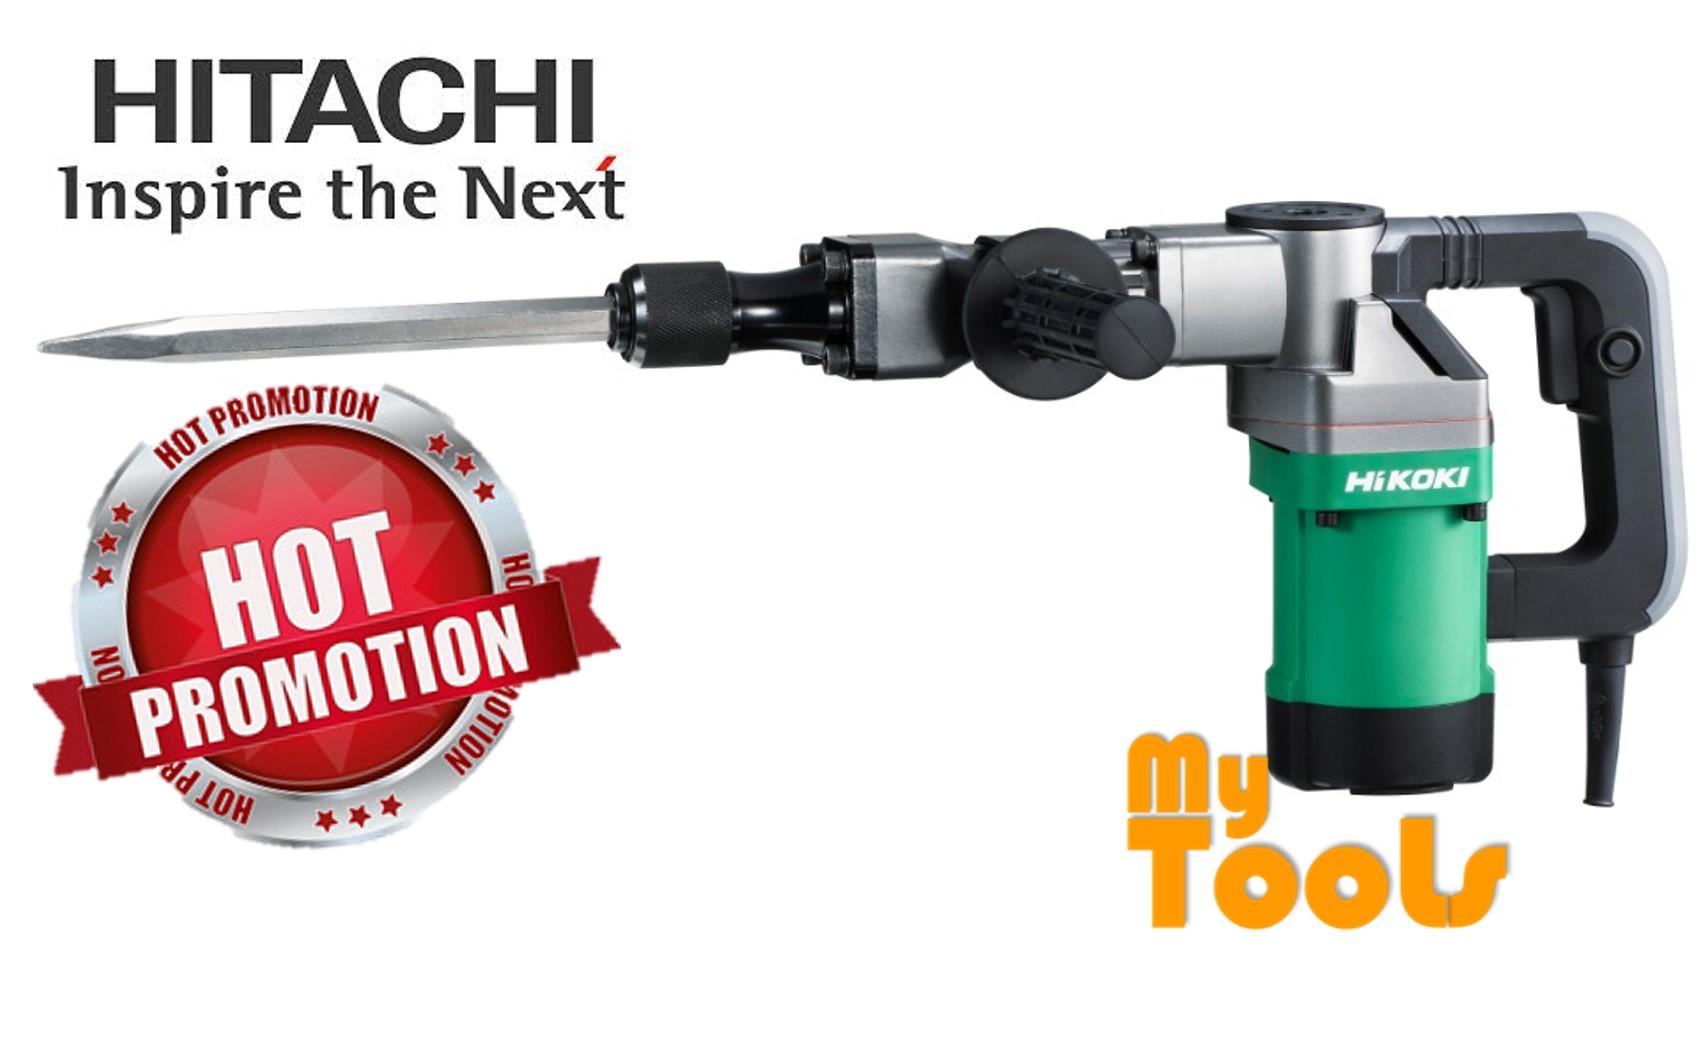 [Limited Time Offer] Hitachi Hikoki H41 SST 950W 17mm Hex Demolition Hammer FREE 2 Bullpoint Chilsei